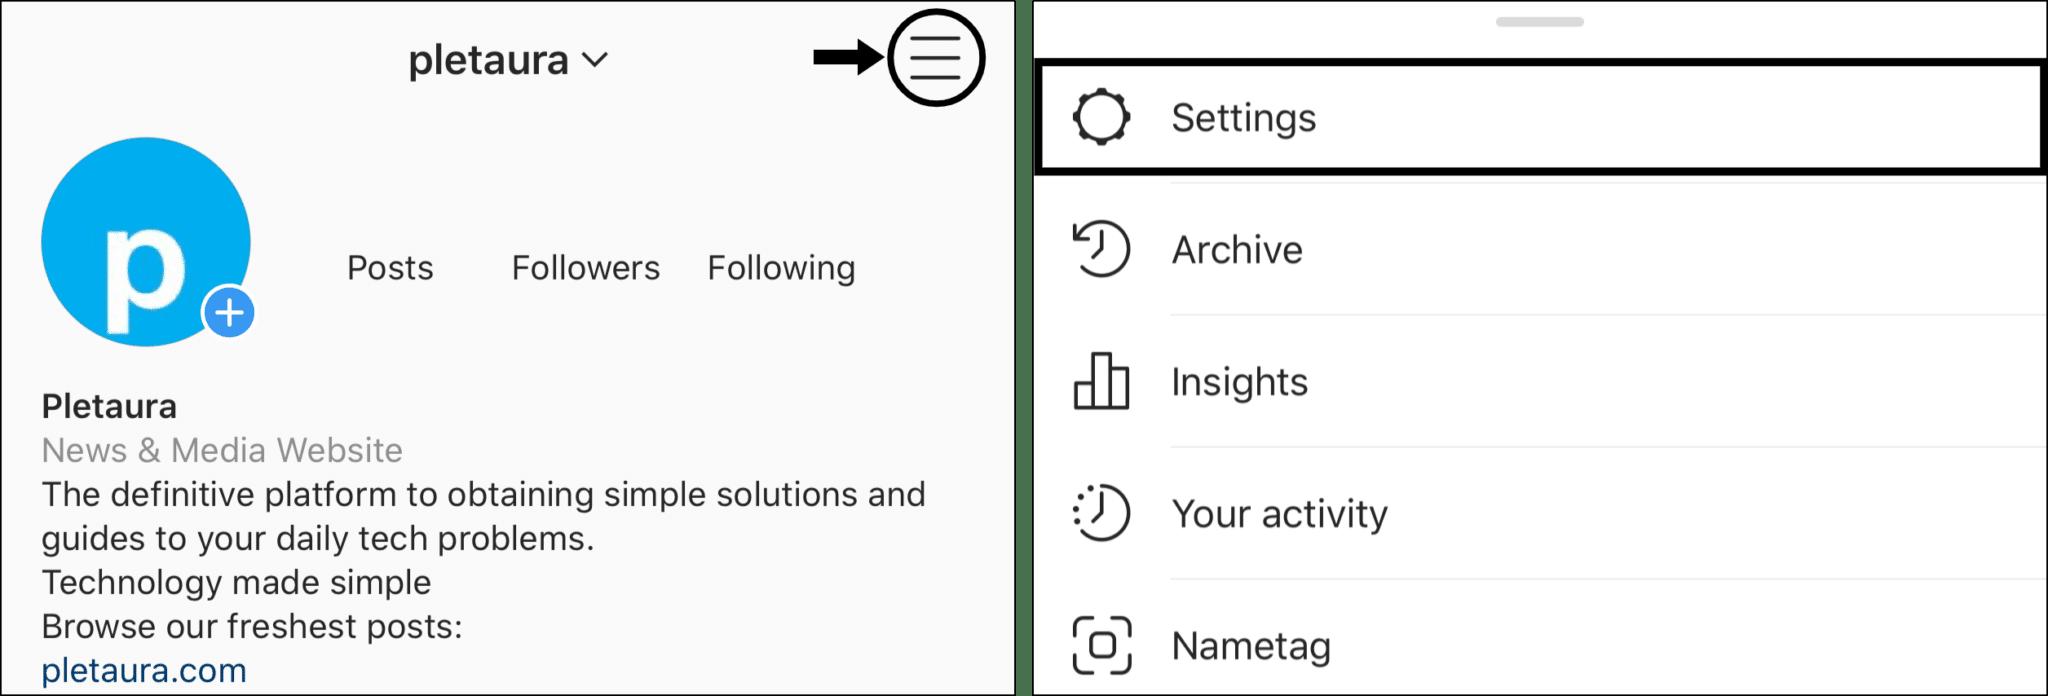 contact Instagram help to fix no sound on Instagram stories